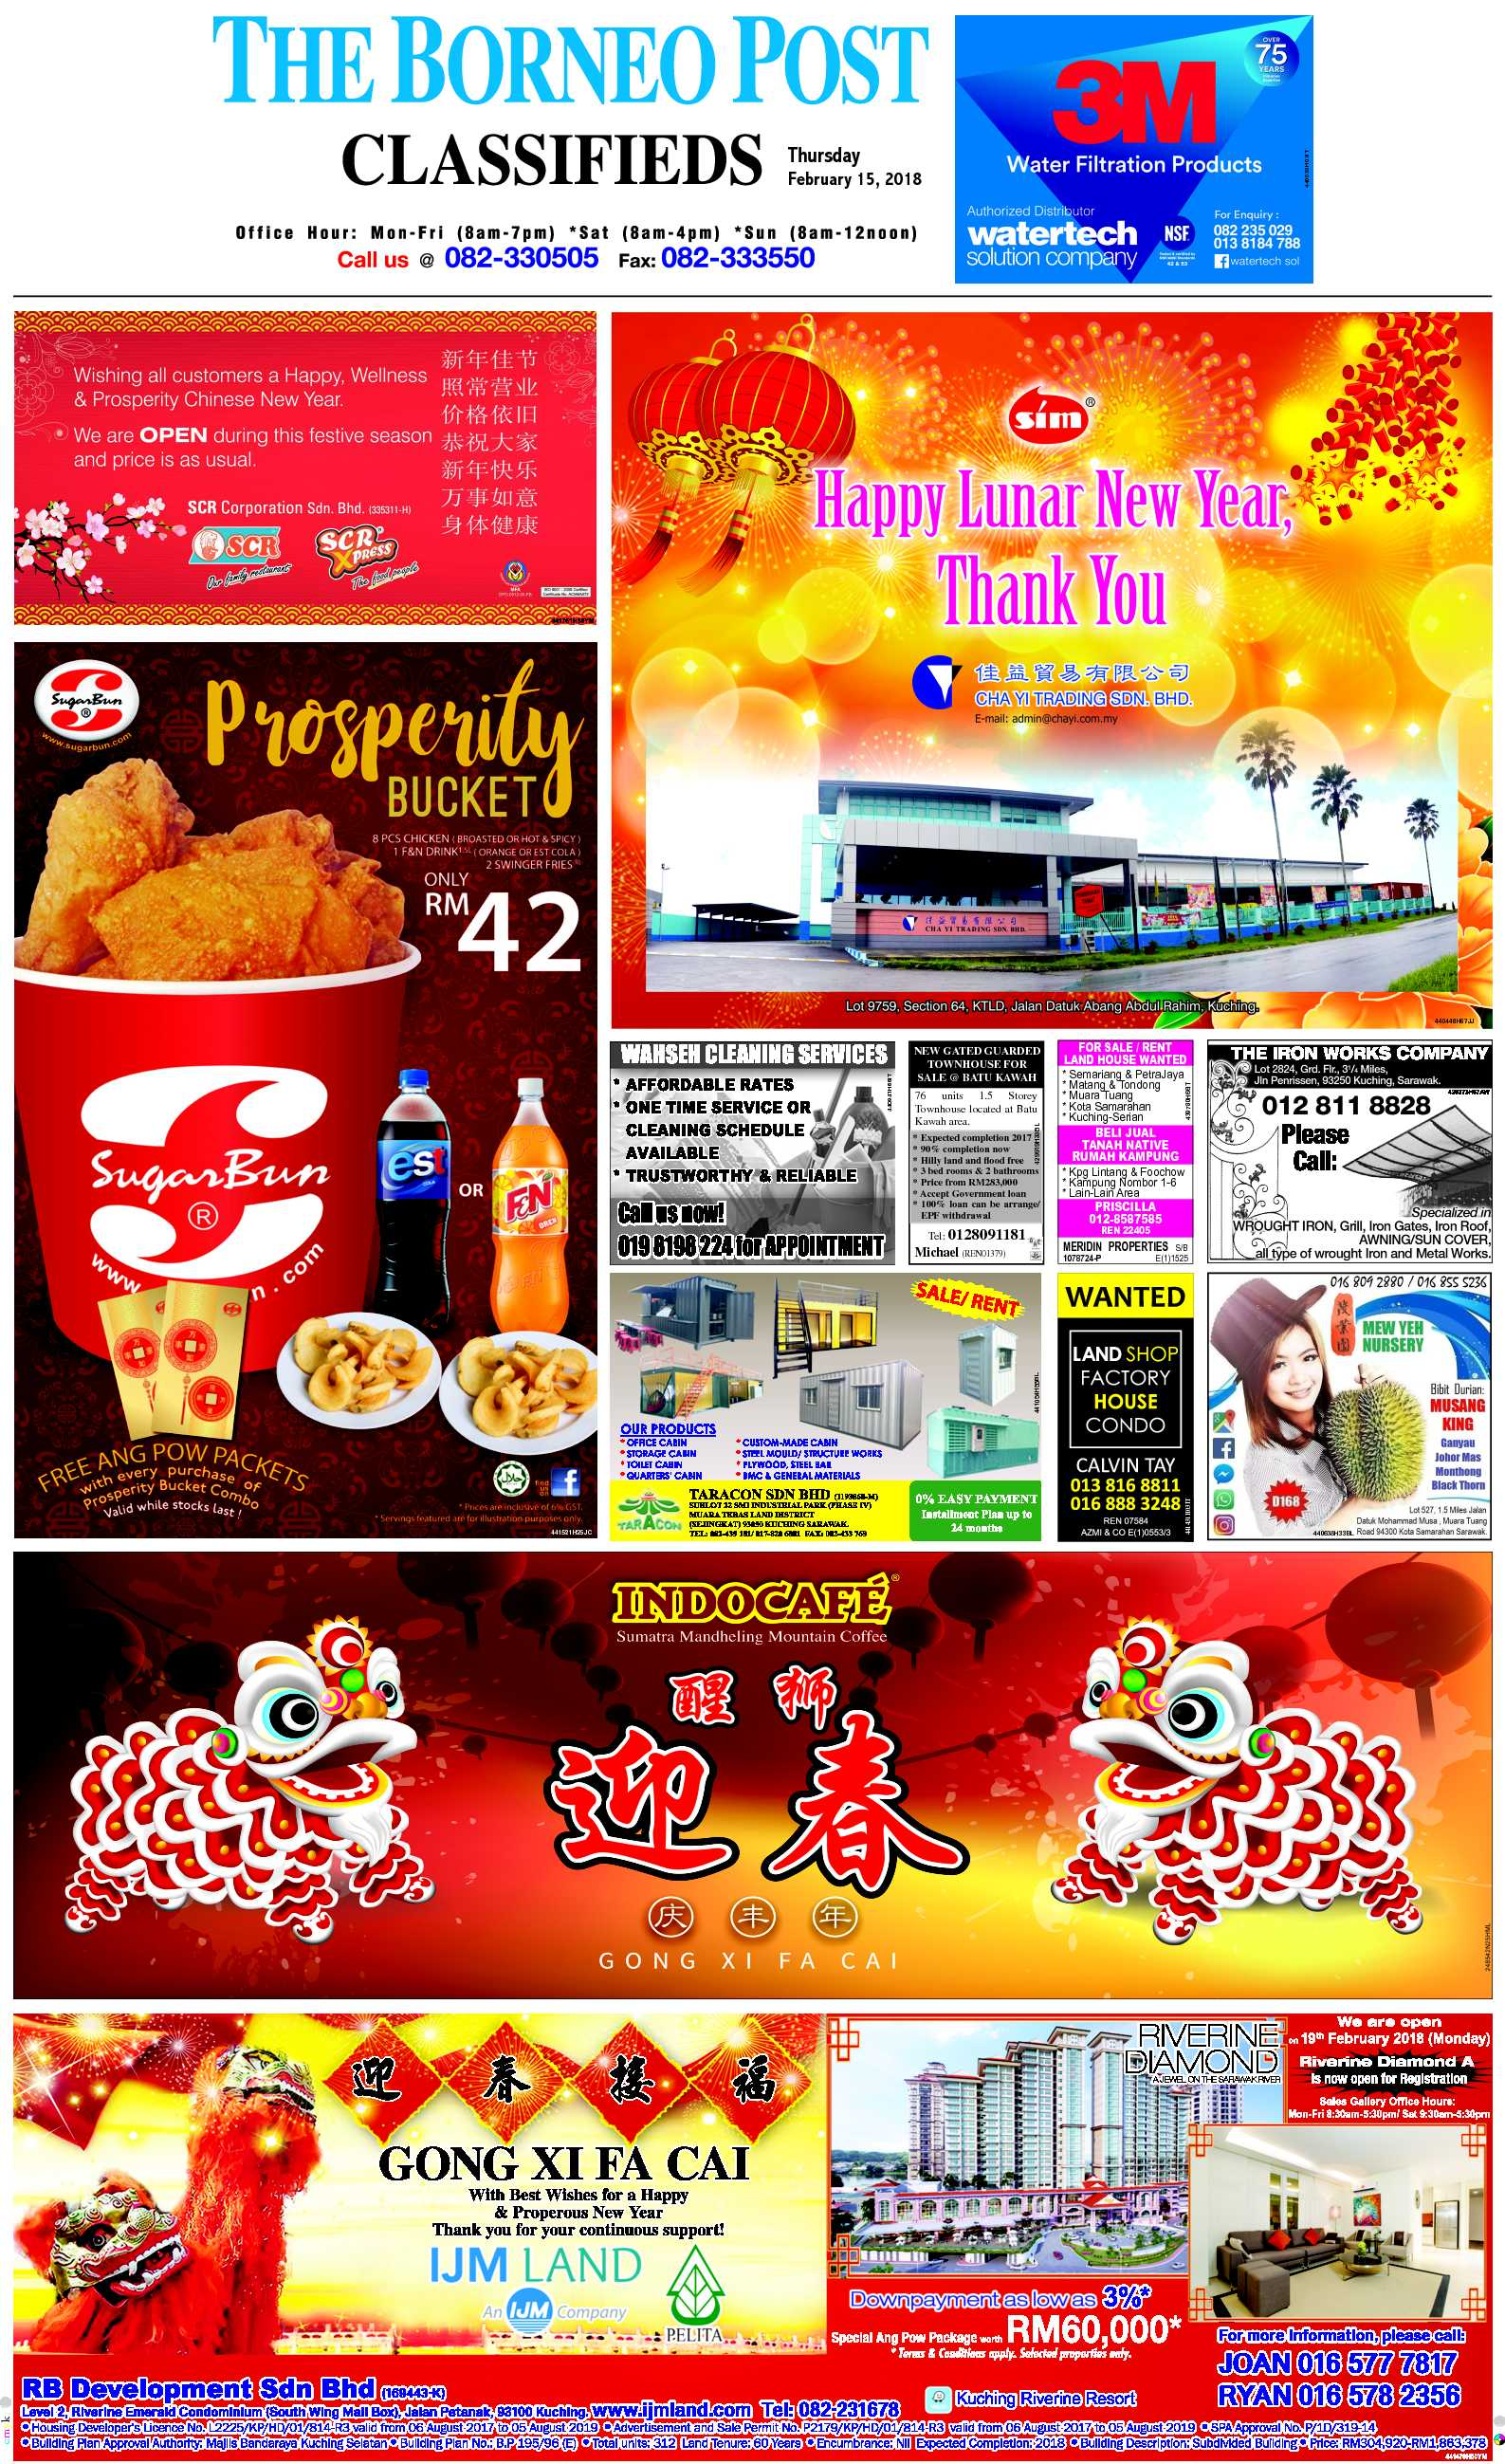 Thursday - Feb 15 | The Borneo Post Classifieds